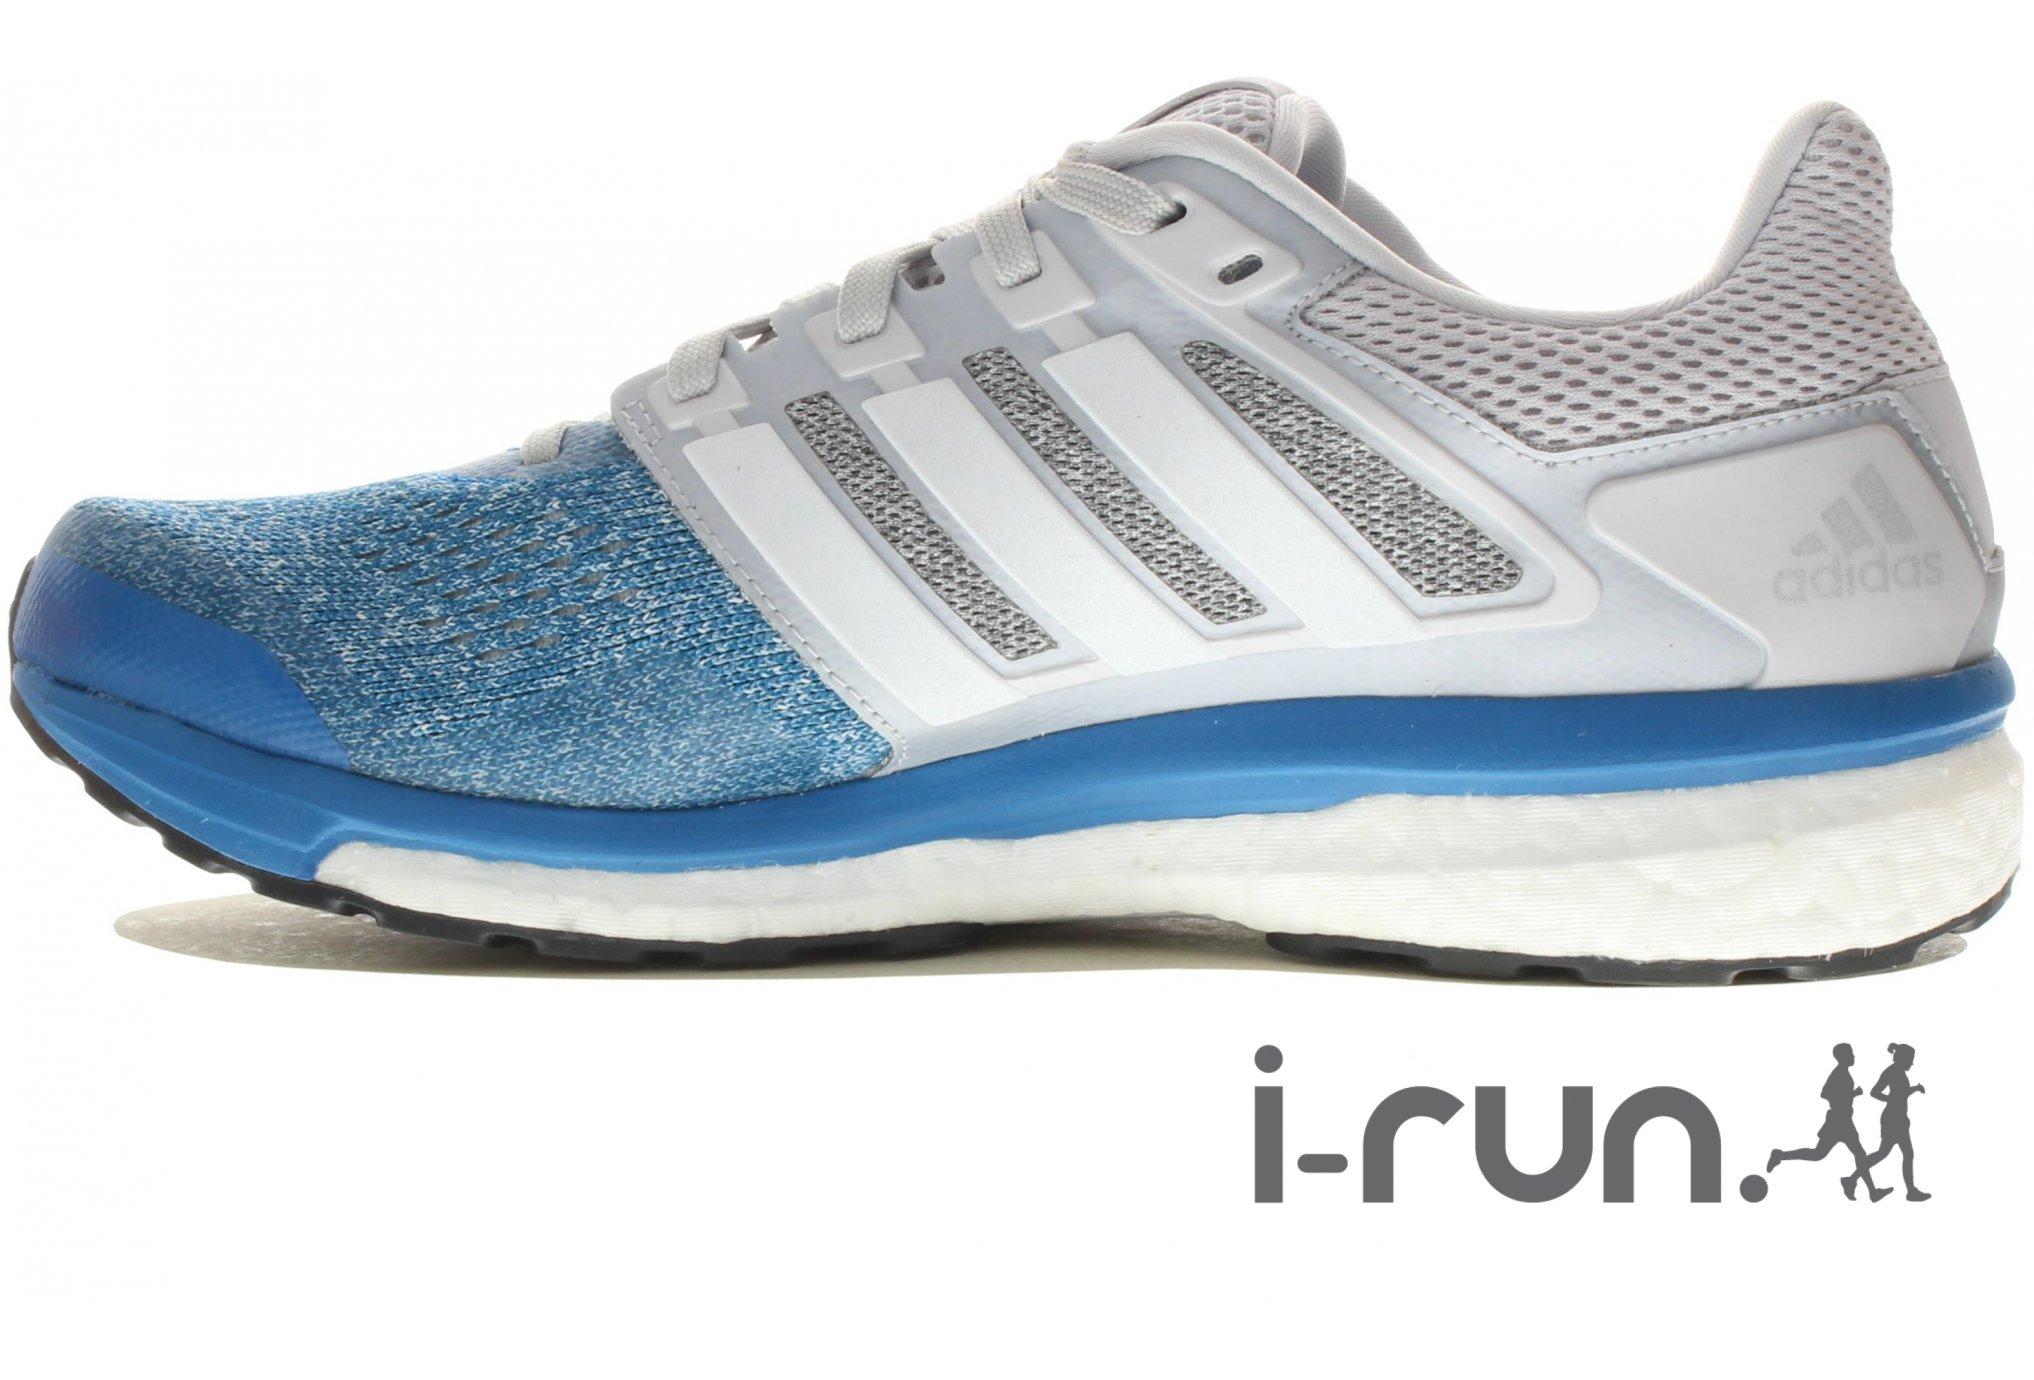 huge discount 89555 e24da adidas-supernova-glide-8-boost-m-chaussures-homme-